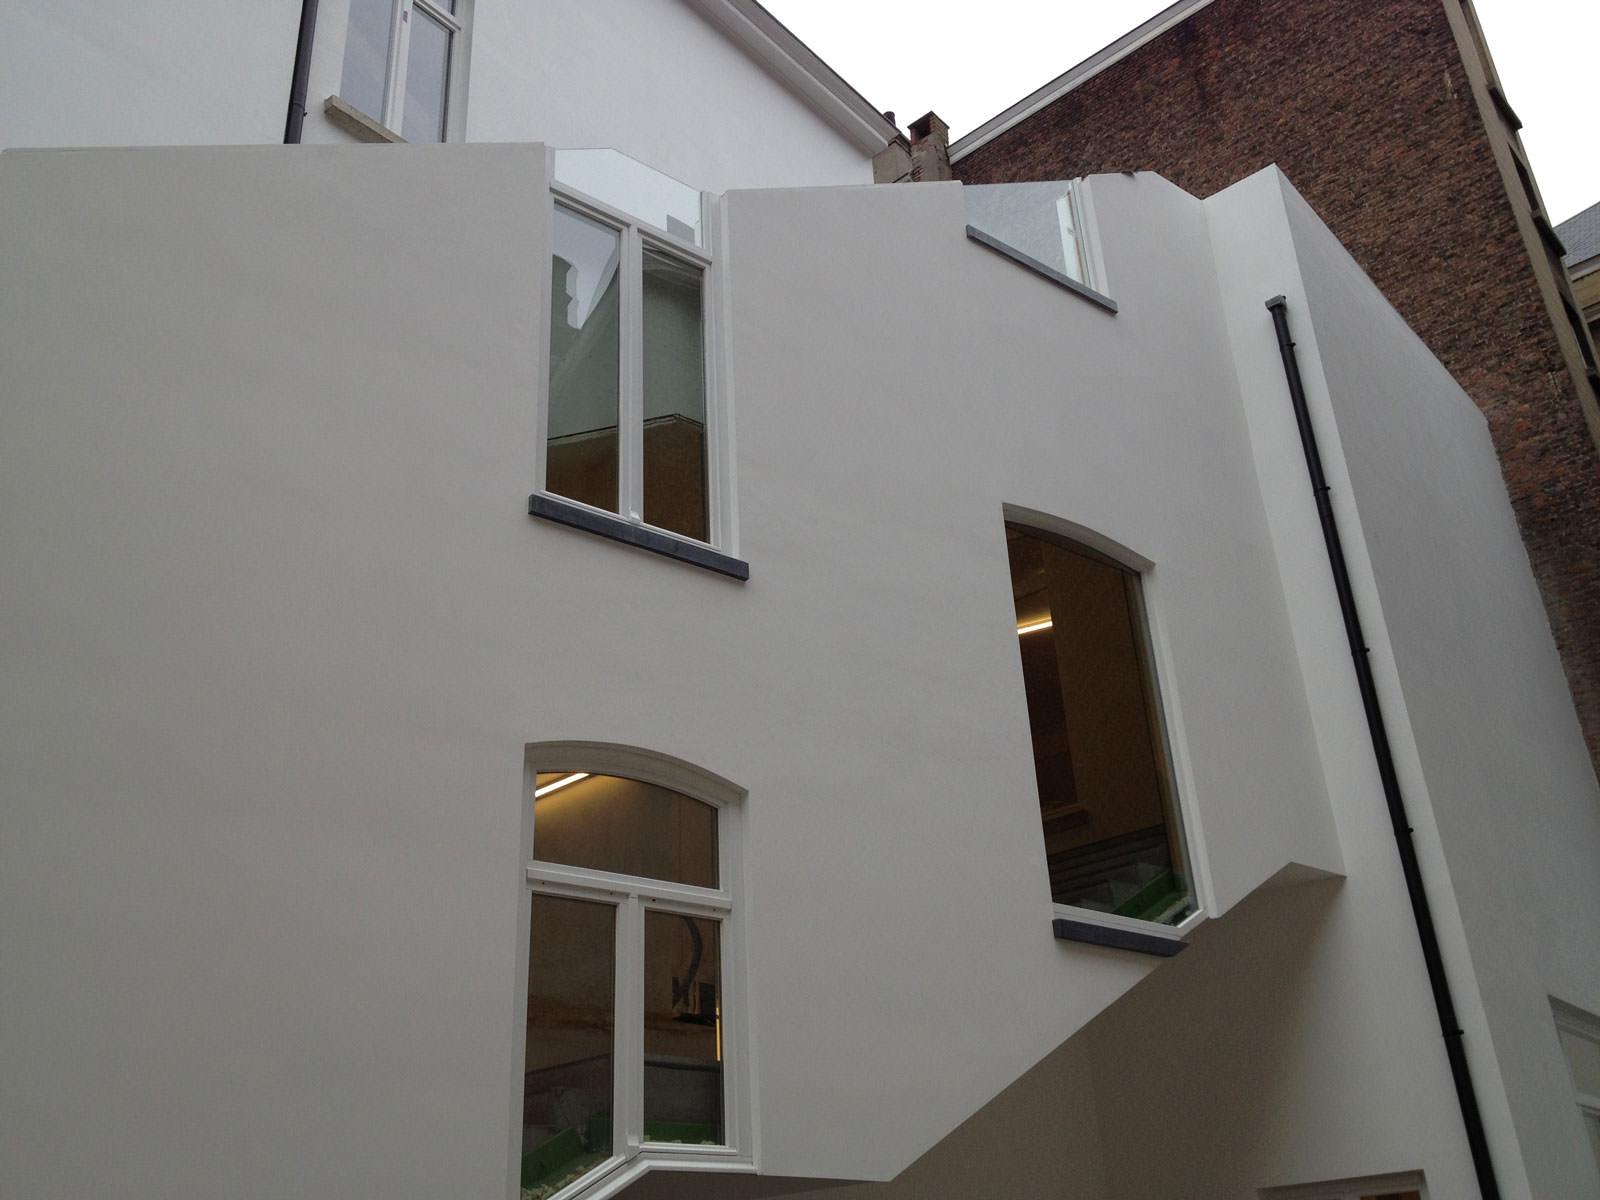 Kledingzaak Twiggy kiest voor moderne architectuur